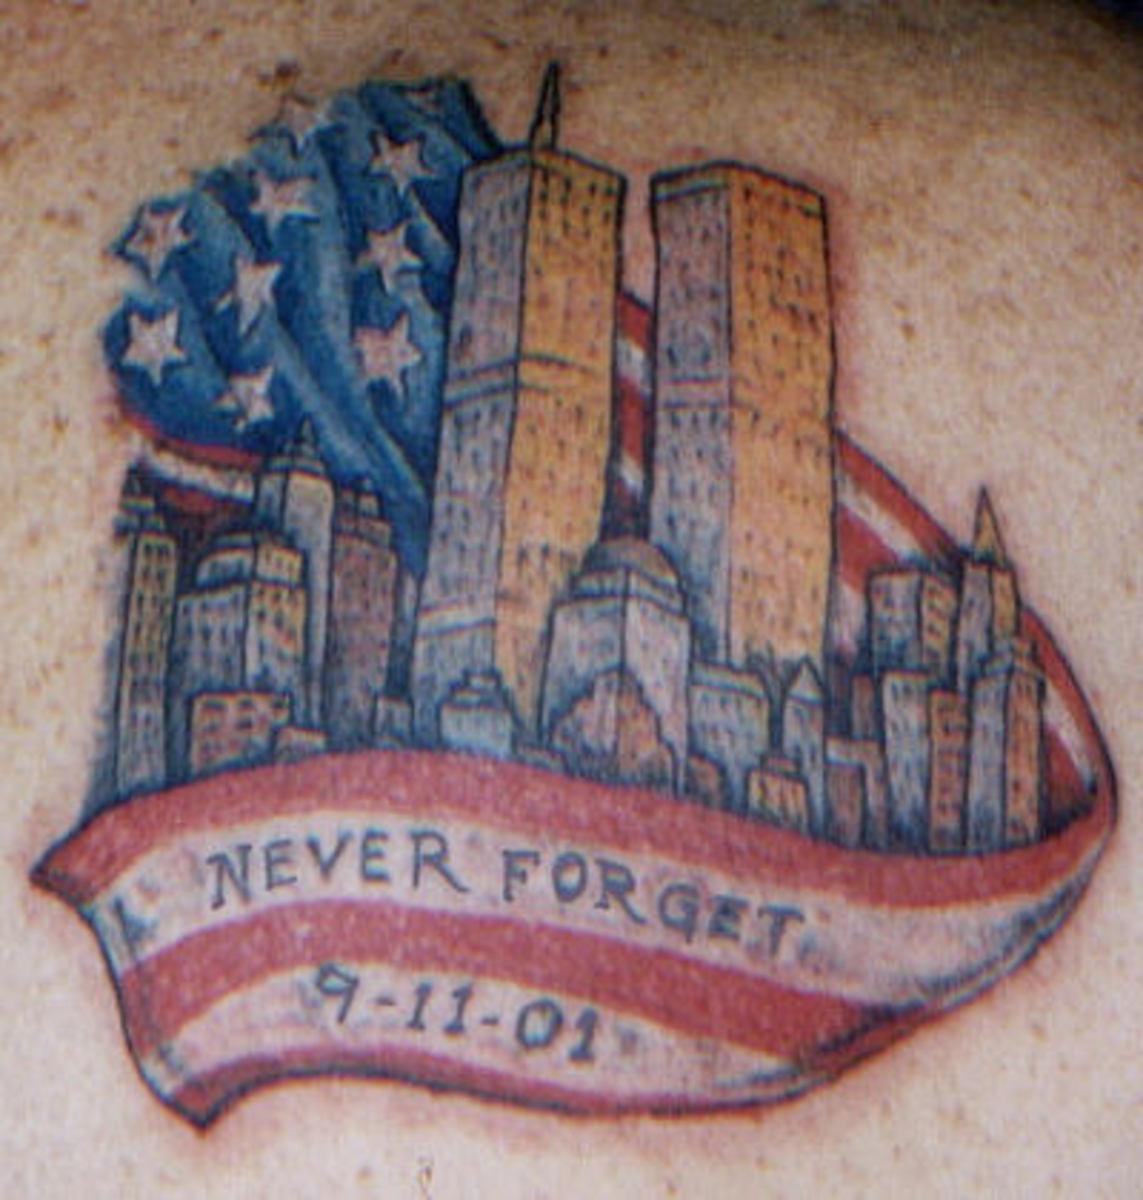 9 11 01 september 11 memorial tattoos. Black Bedroom Furniture Sets. Home Design Ideas